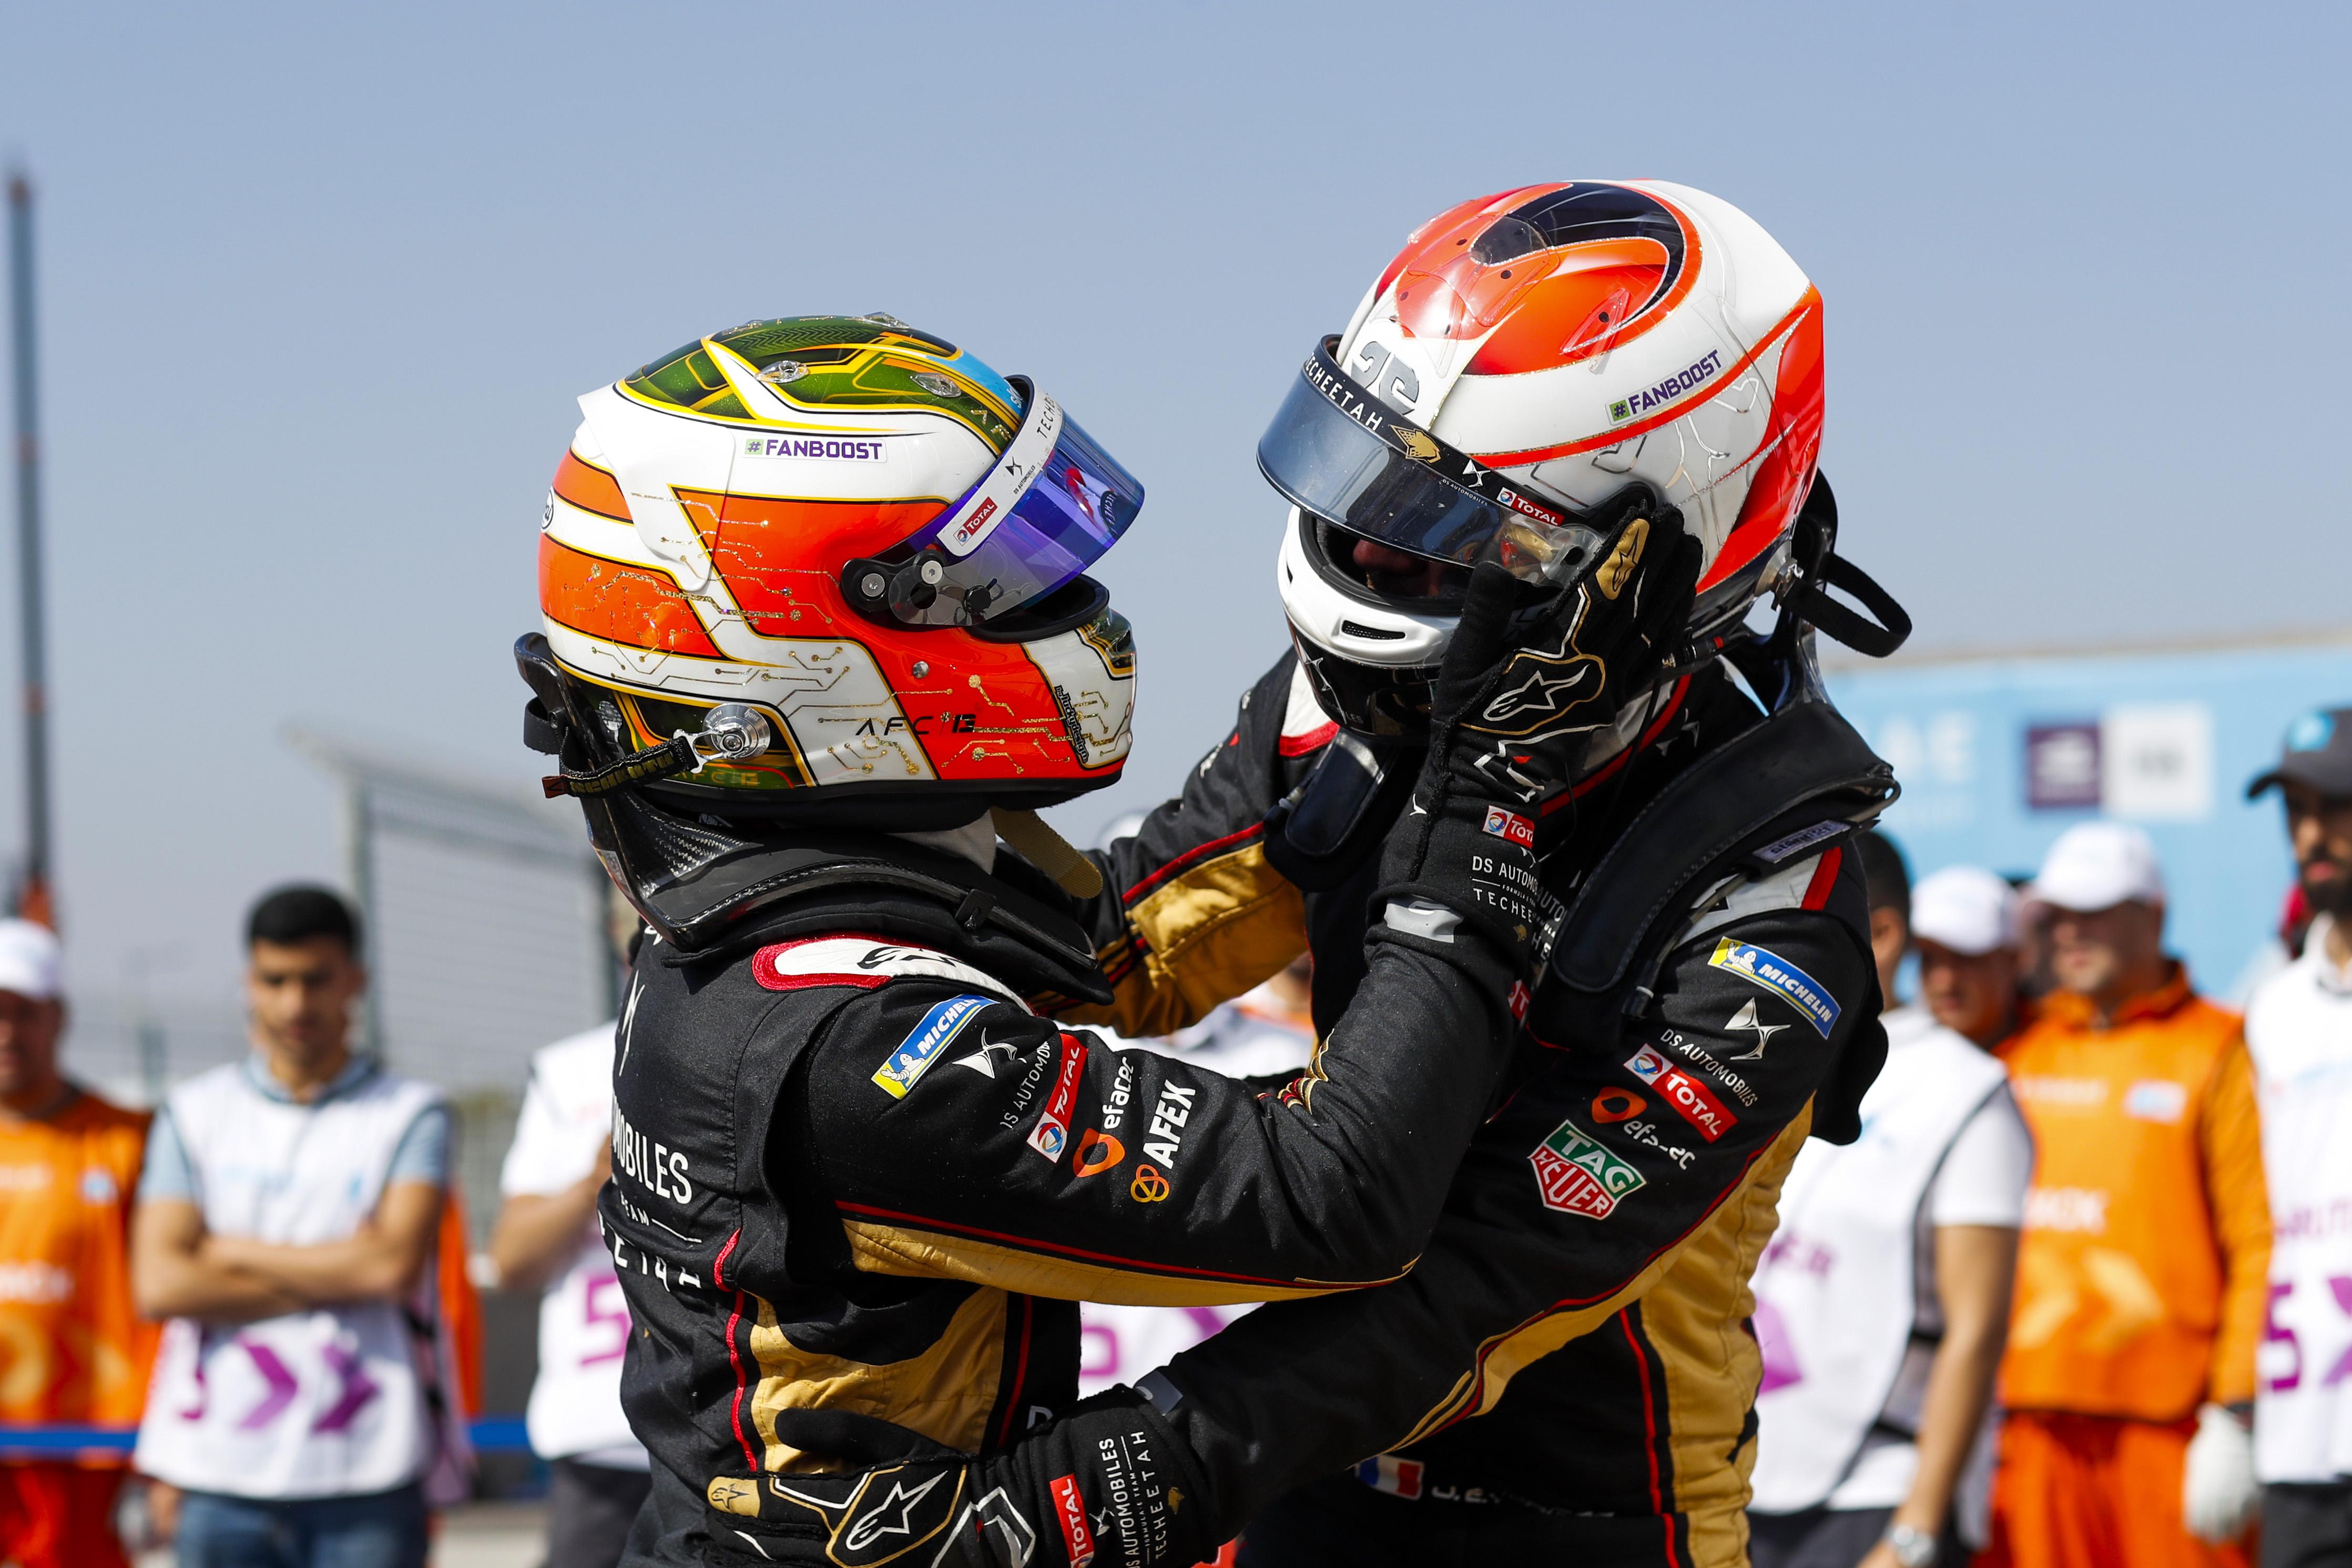 Da Costa wins as Techeetah take double podium in Marrakesh